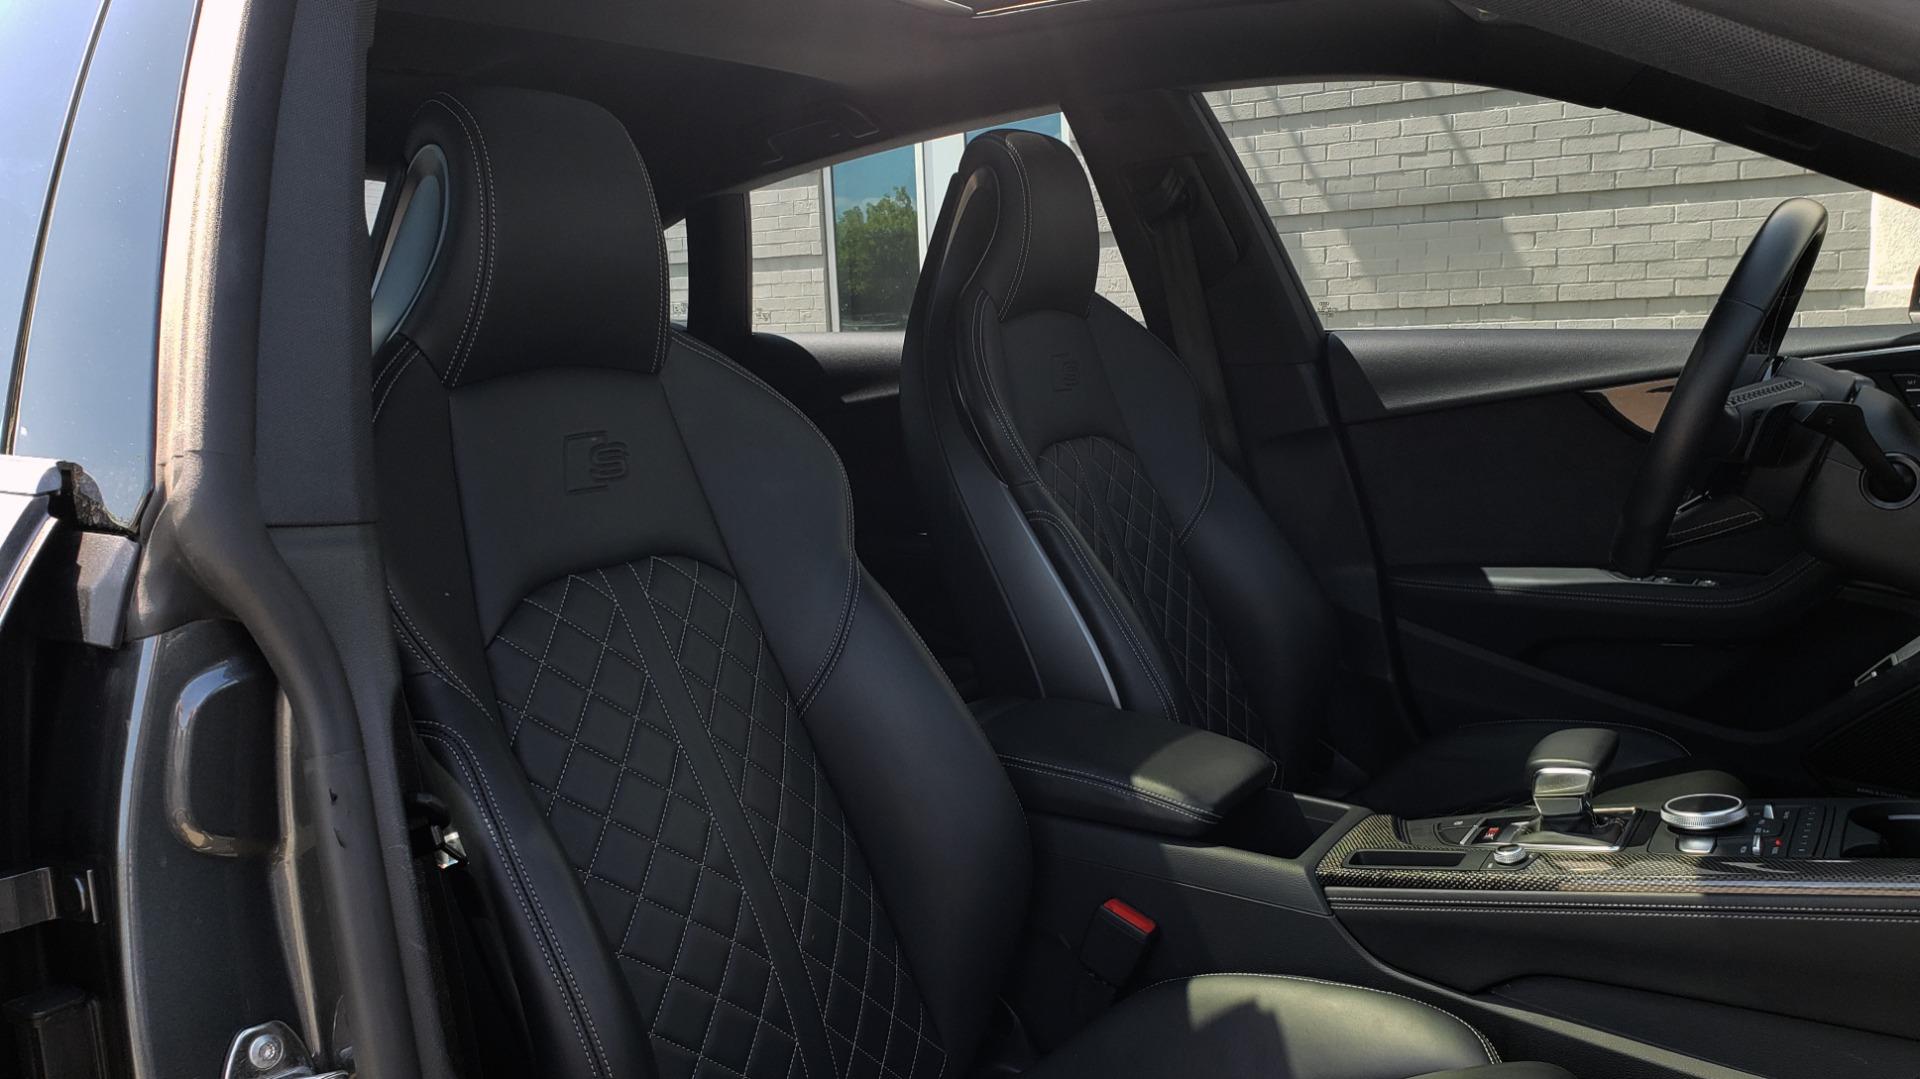 Used 2018 Audi S5 SPORTBACK PRESTIGE S-SPORT / NAV / SUNROOF / HUD / B&O SND / REARVIEW for sale $48,995 at Formula Imports in Charlotte NC 28227 57